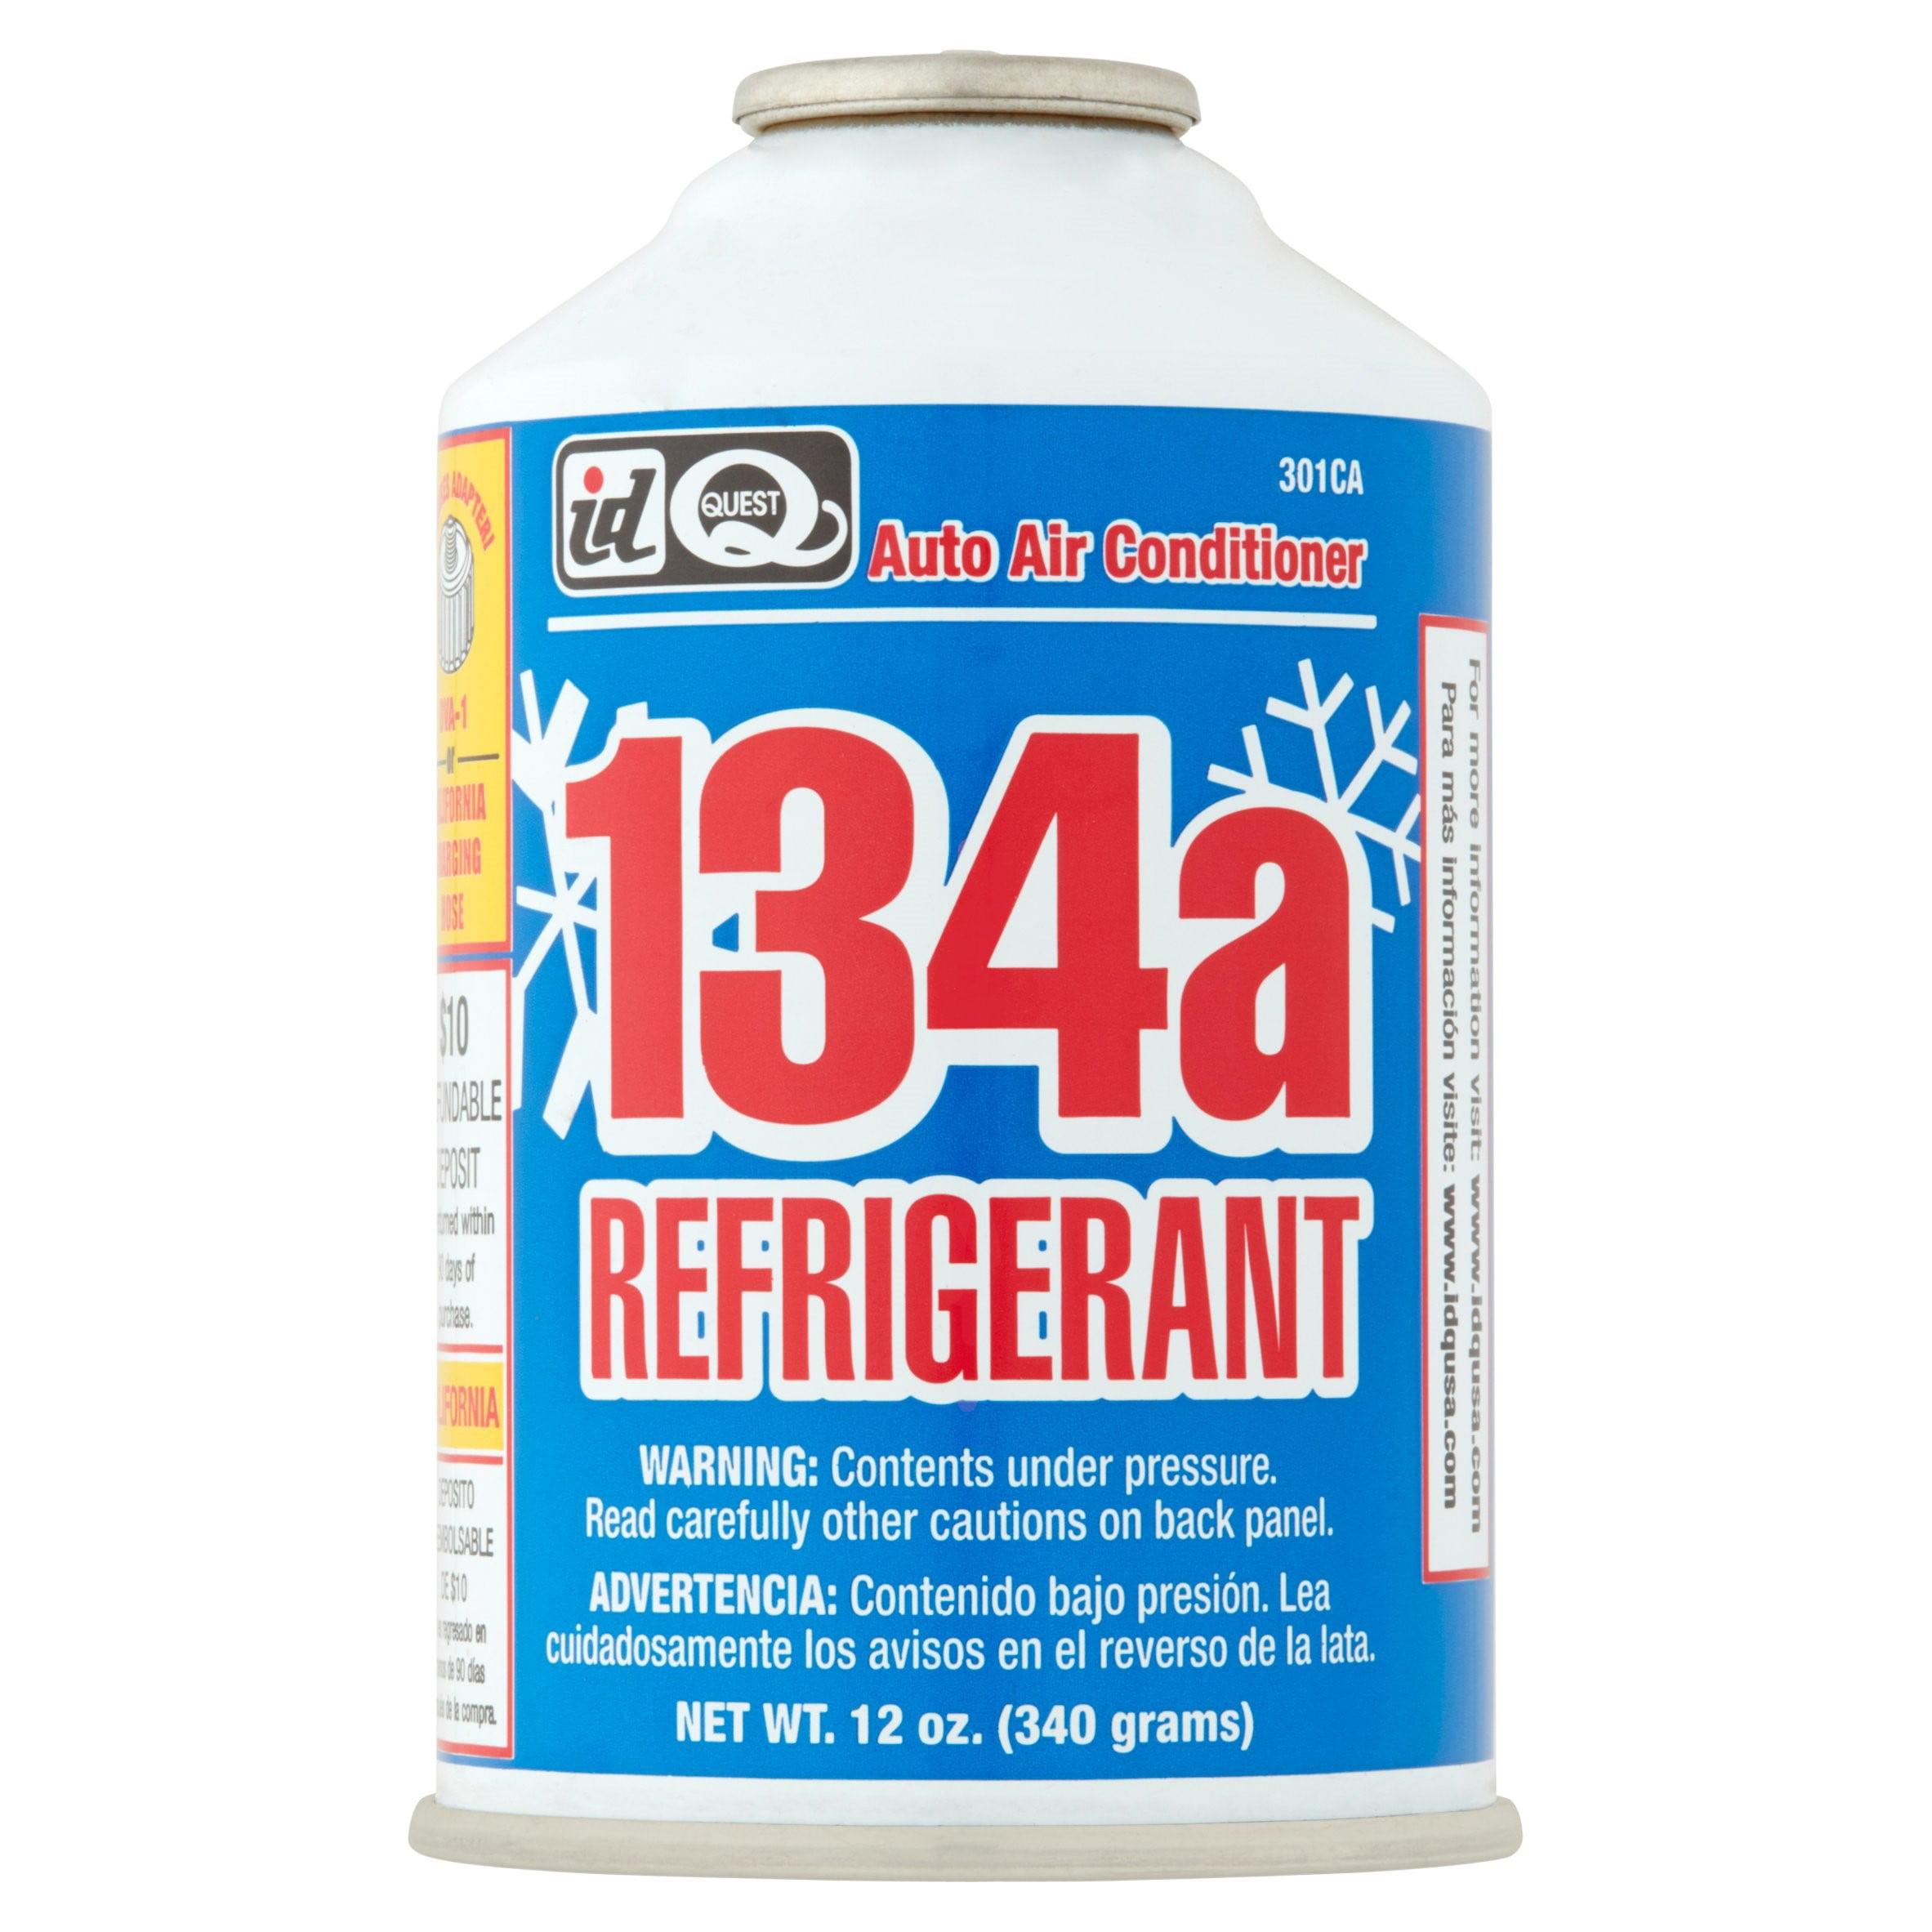 Interdynamics Auto Air Conditioner R-134a Refrigerant, 12 oz, 301CA